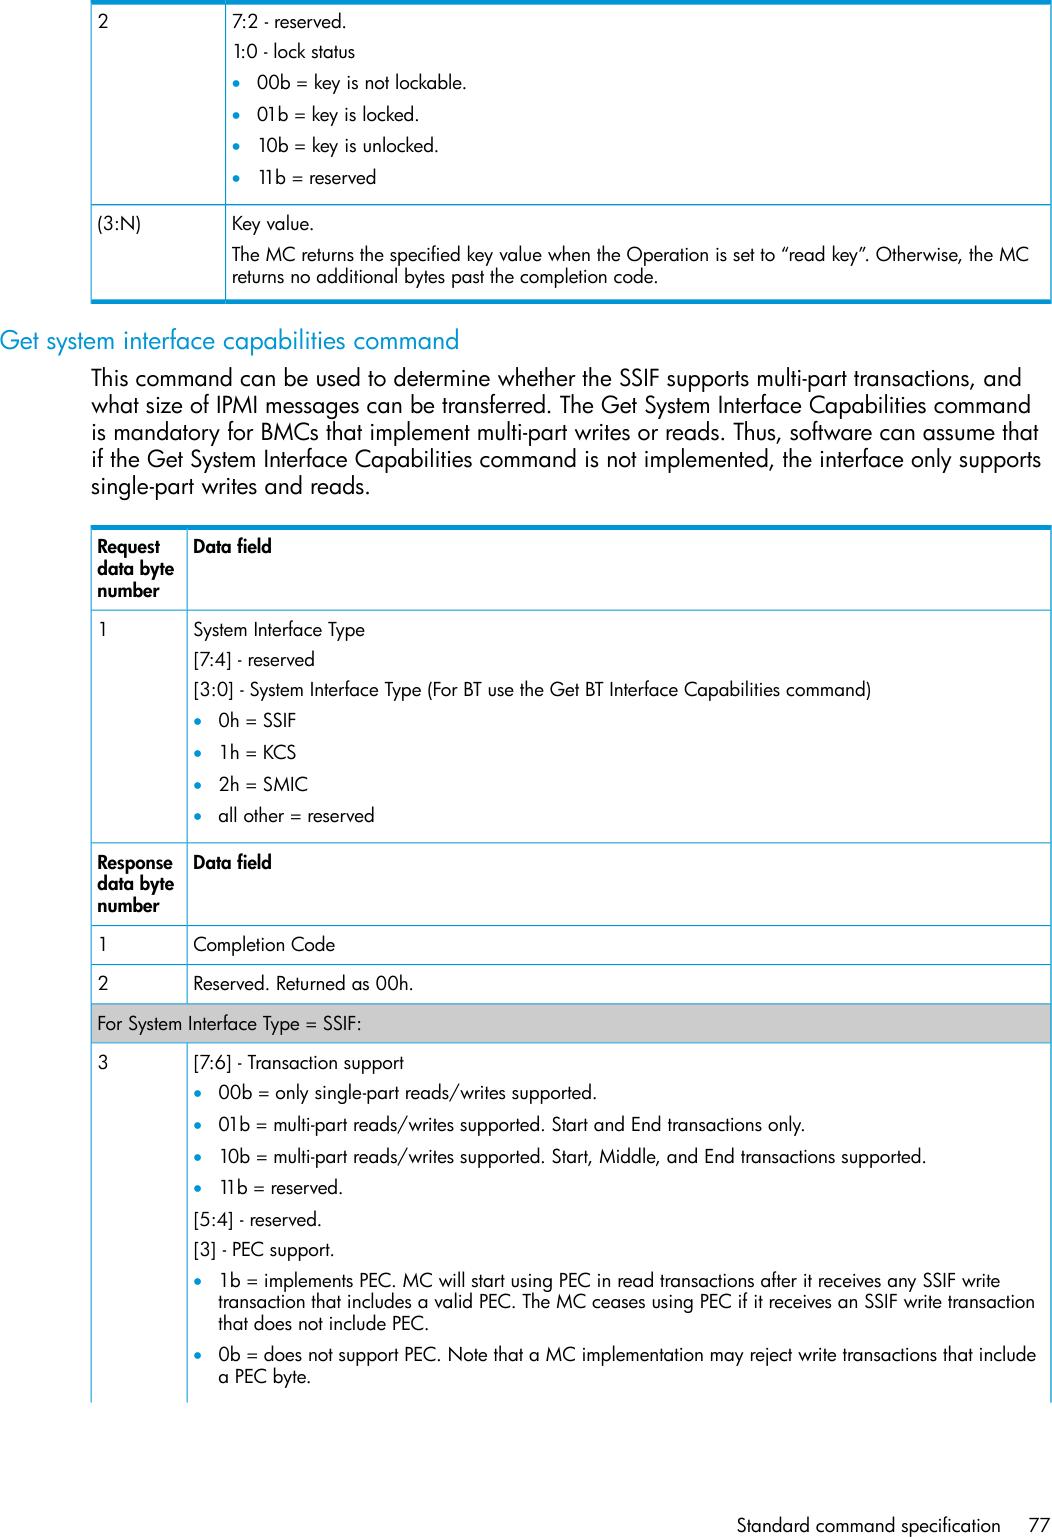 Hp Proliant Moonshot Server Cartridge Users Manual ILO